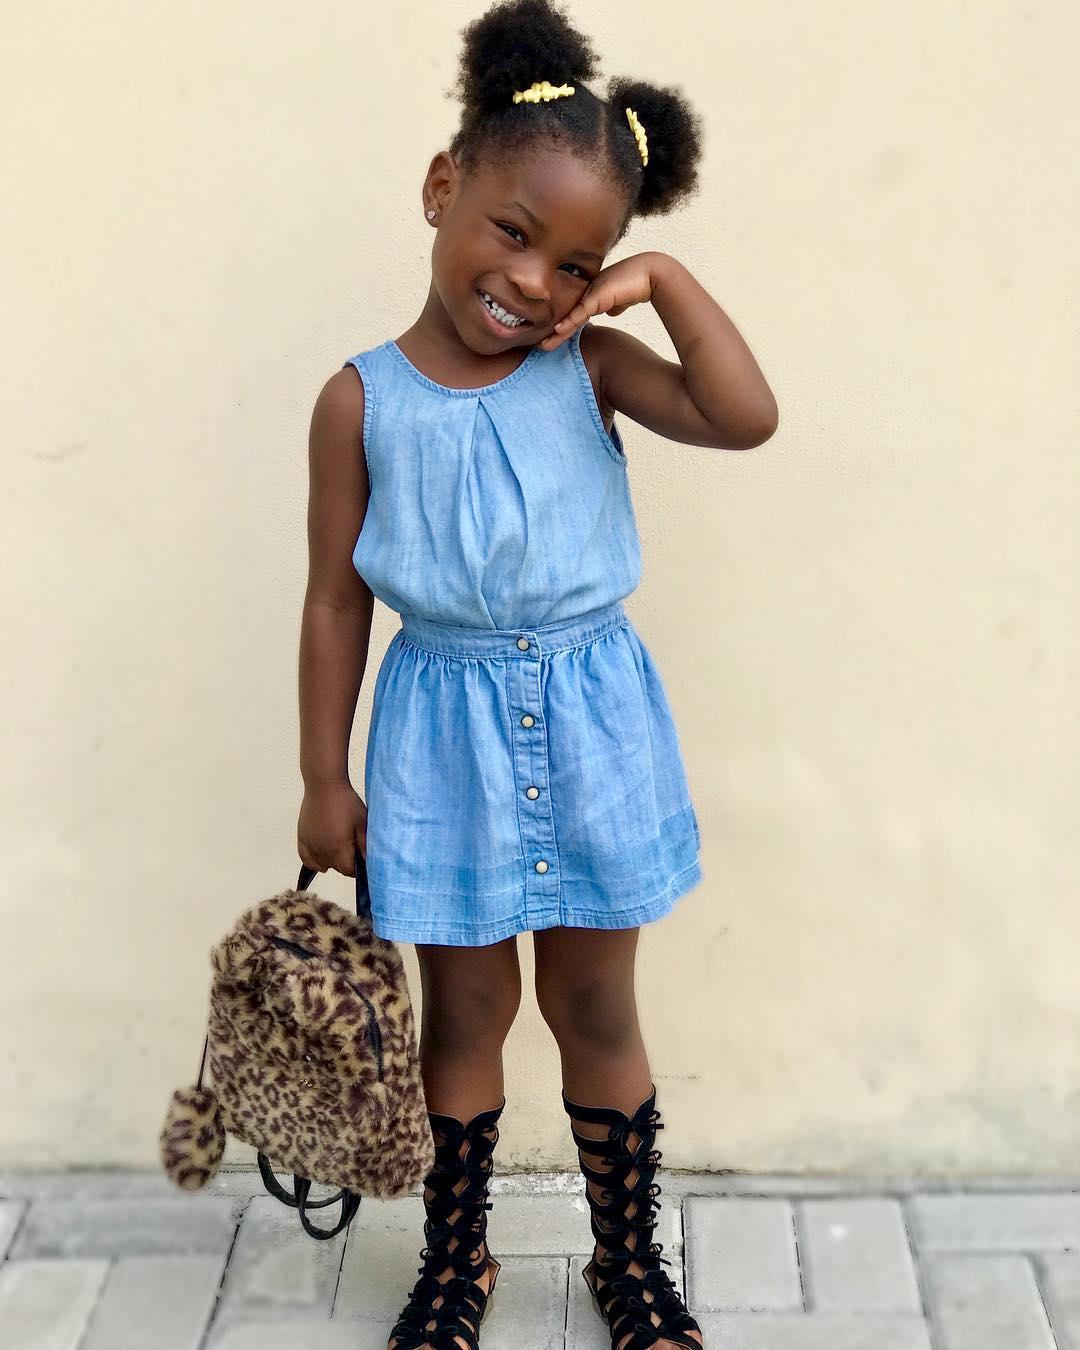 Davido's daughter Imade Adeleke